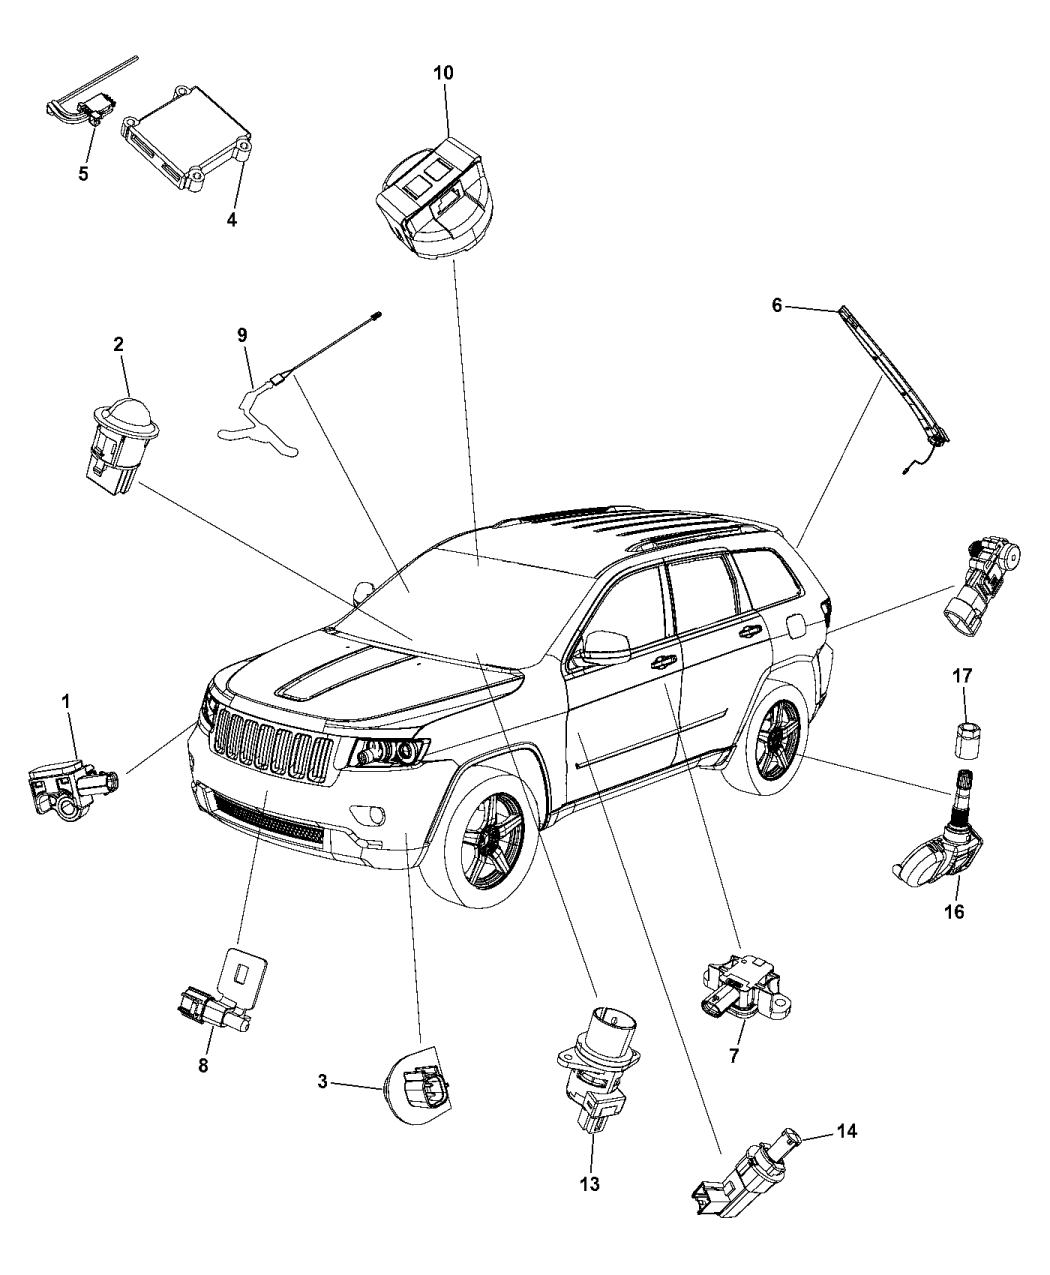 2016 jeep grand cherokee sensors - body